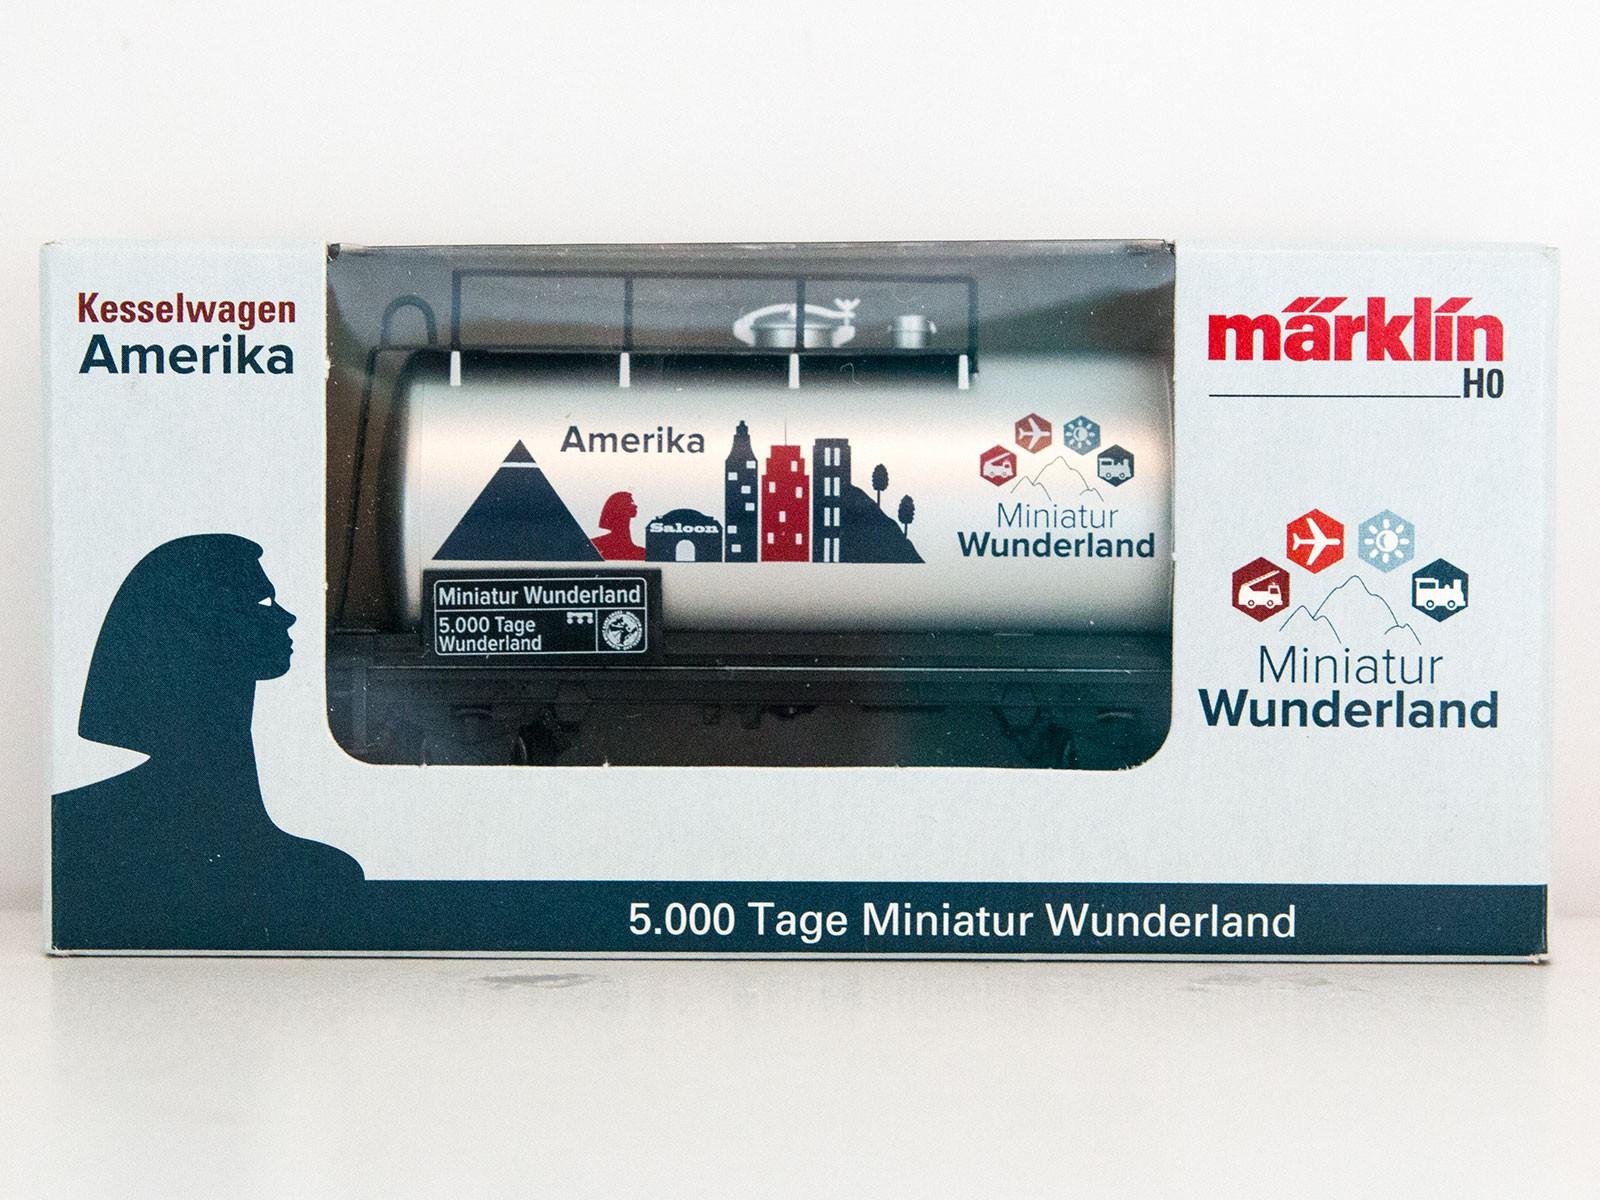 "Sonderwagen H0 Märklin 2015 Kesselwagen ""5000 Tage Wunderland - Amerika"""